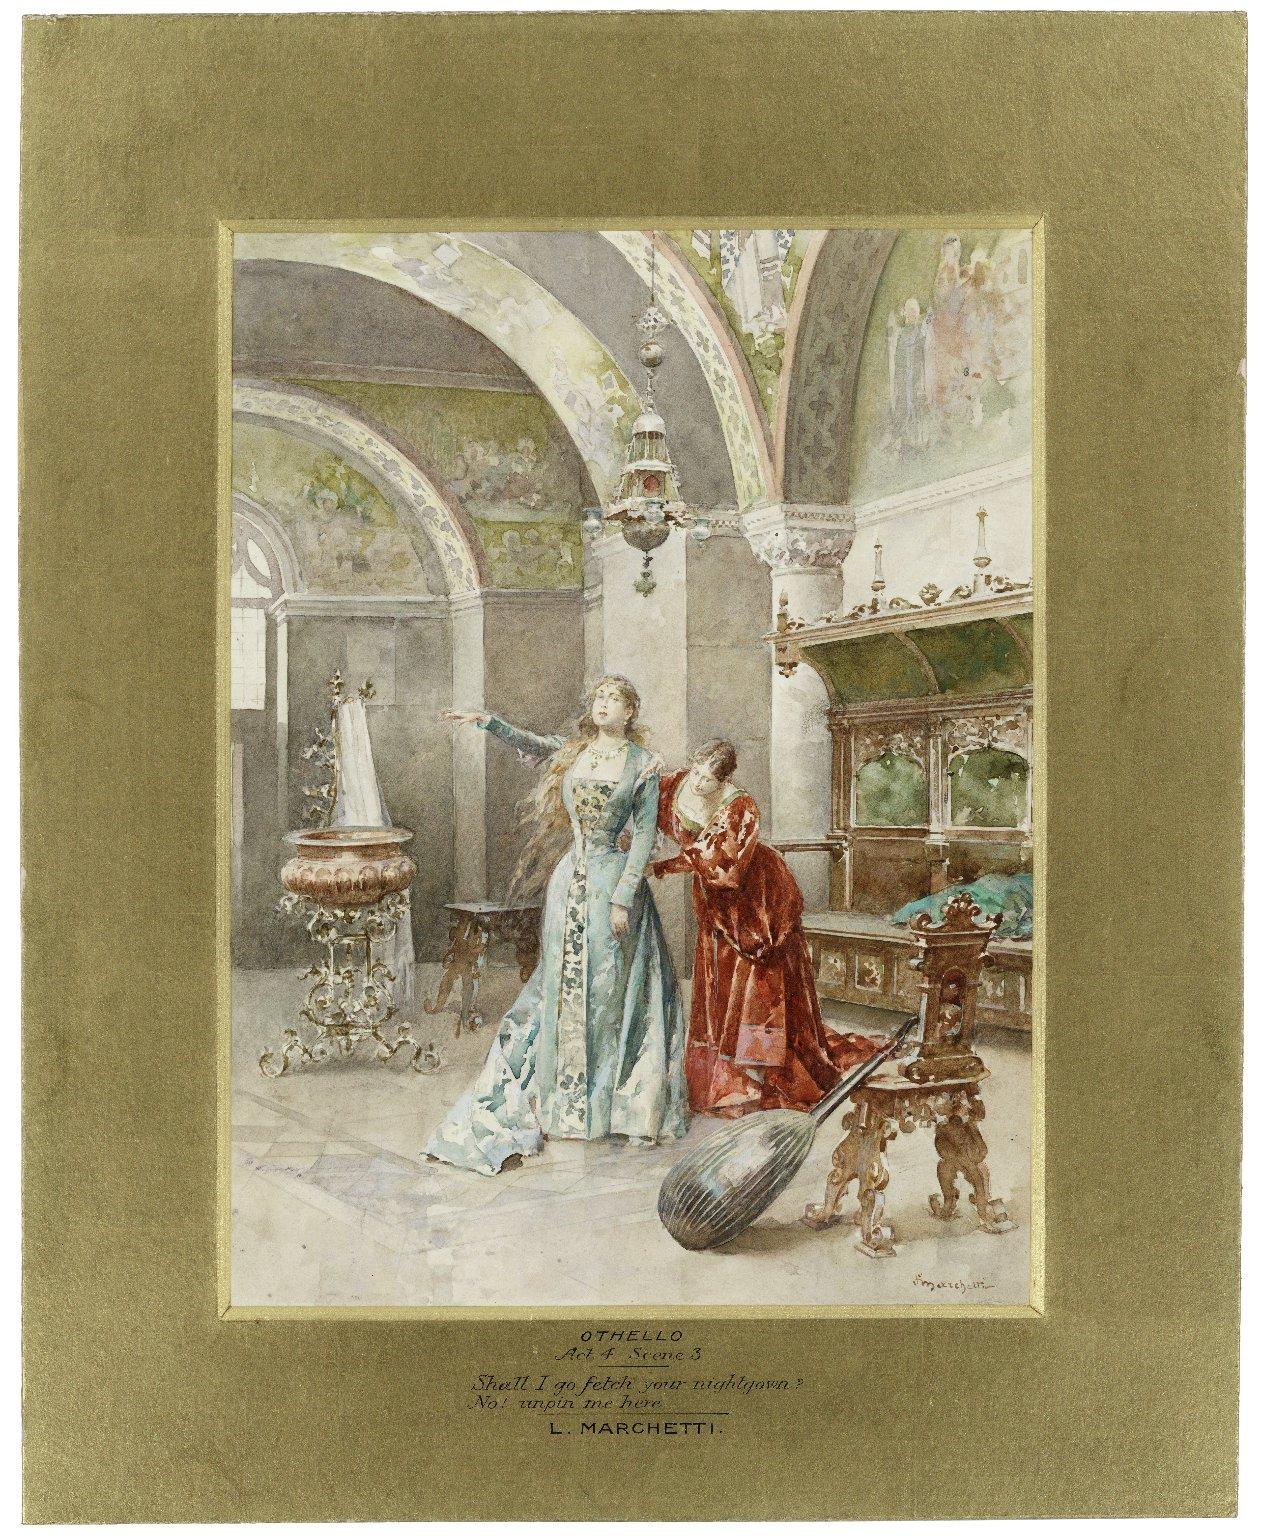 "Othello, act 4, scene 3: ""Shall I go fetch your nightgown? No! unpin me here"" [graphic] / L. Marchetti."